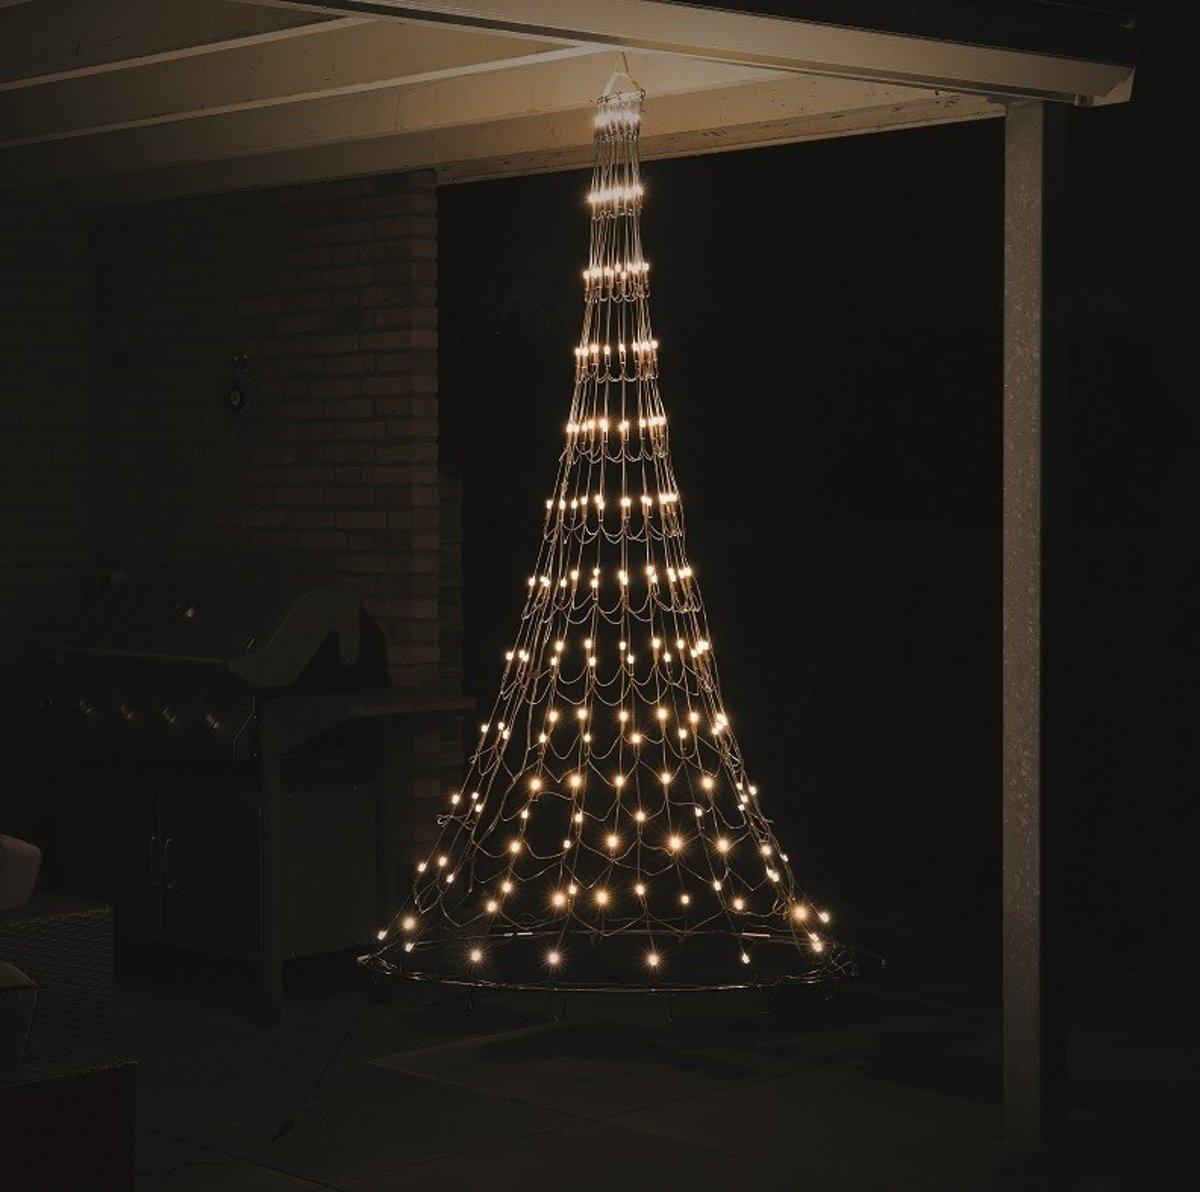 Nordik Lights - Hangende kegelkerstboom-1,80 cm - 196 warmwitte LED lampjes kopen